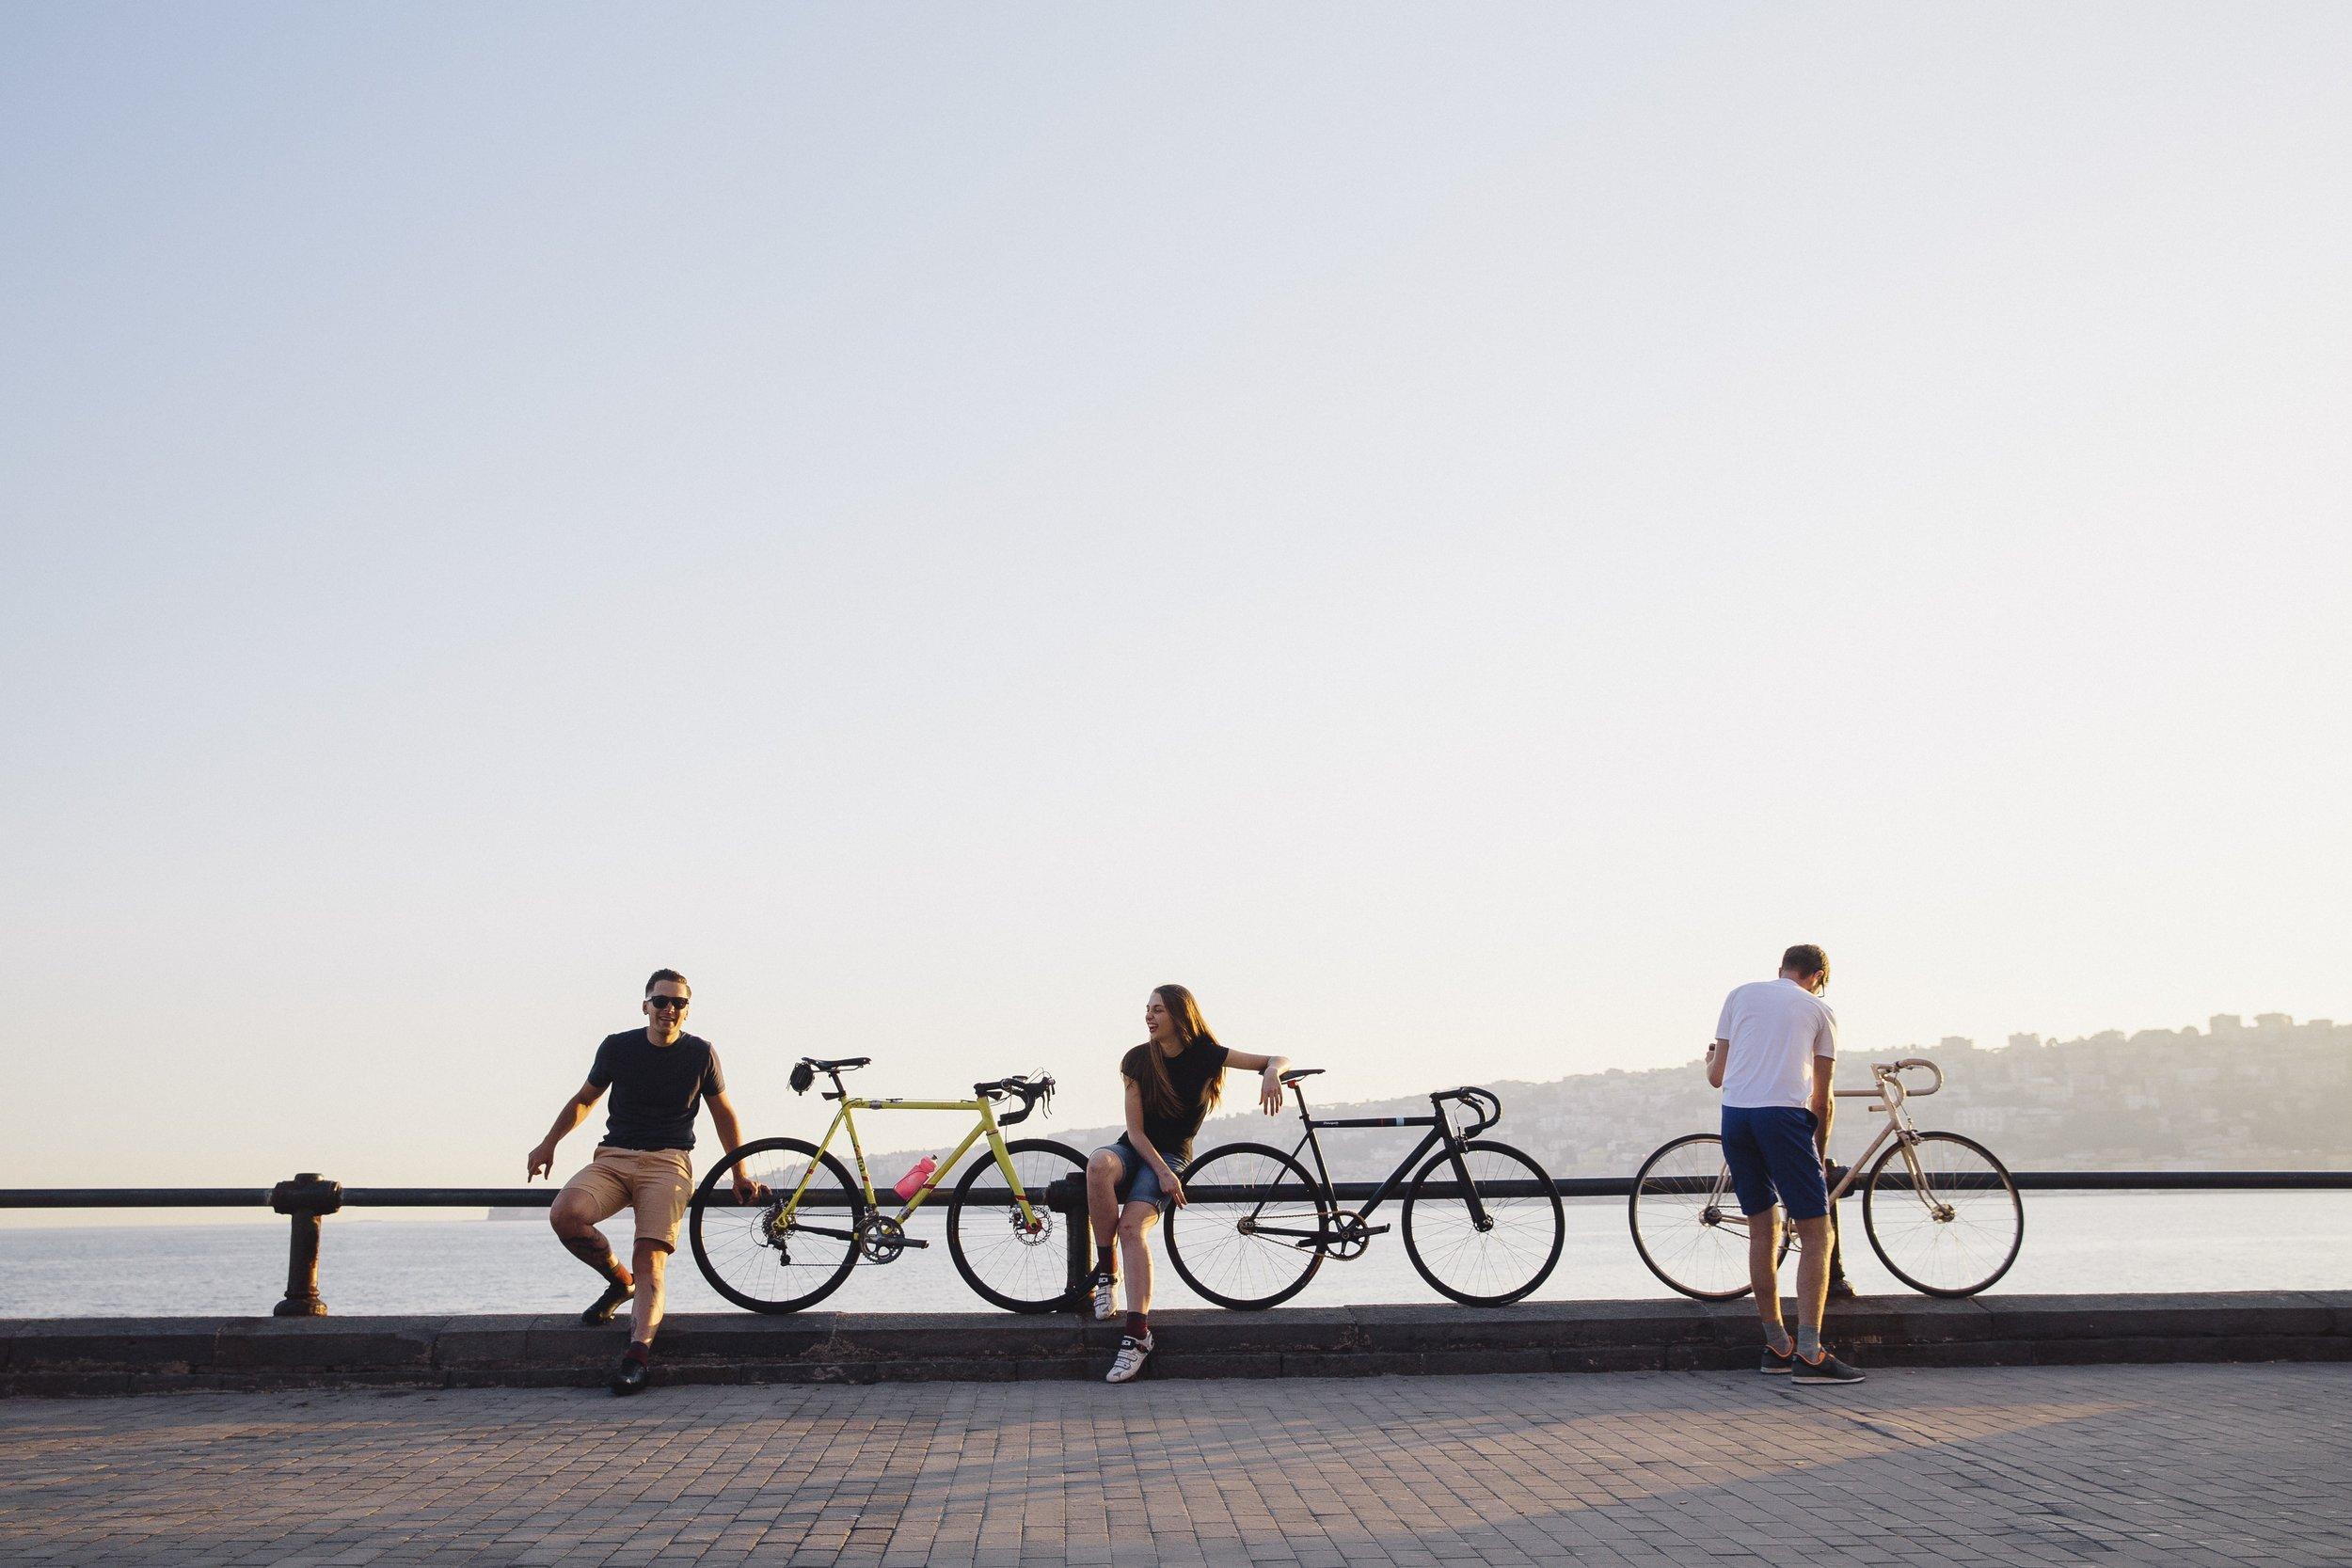 vulpine nick hussey cycling style apparel urban city napoli.jpg